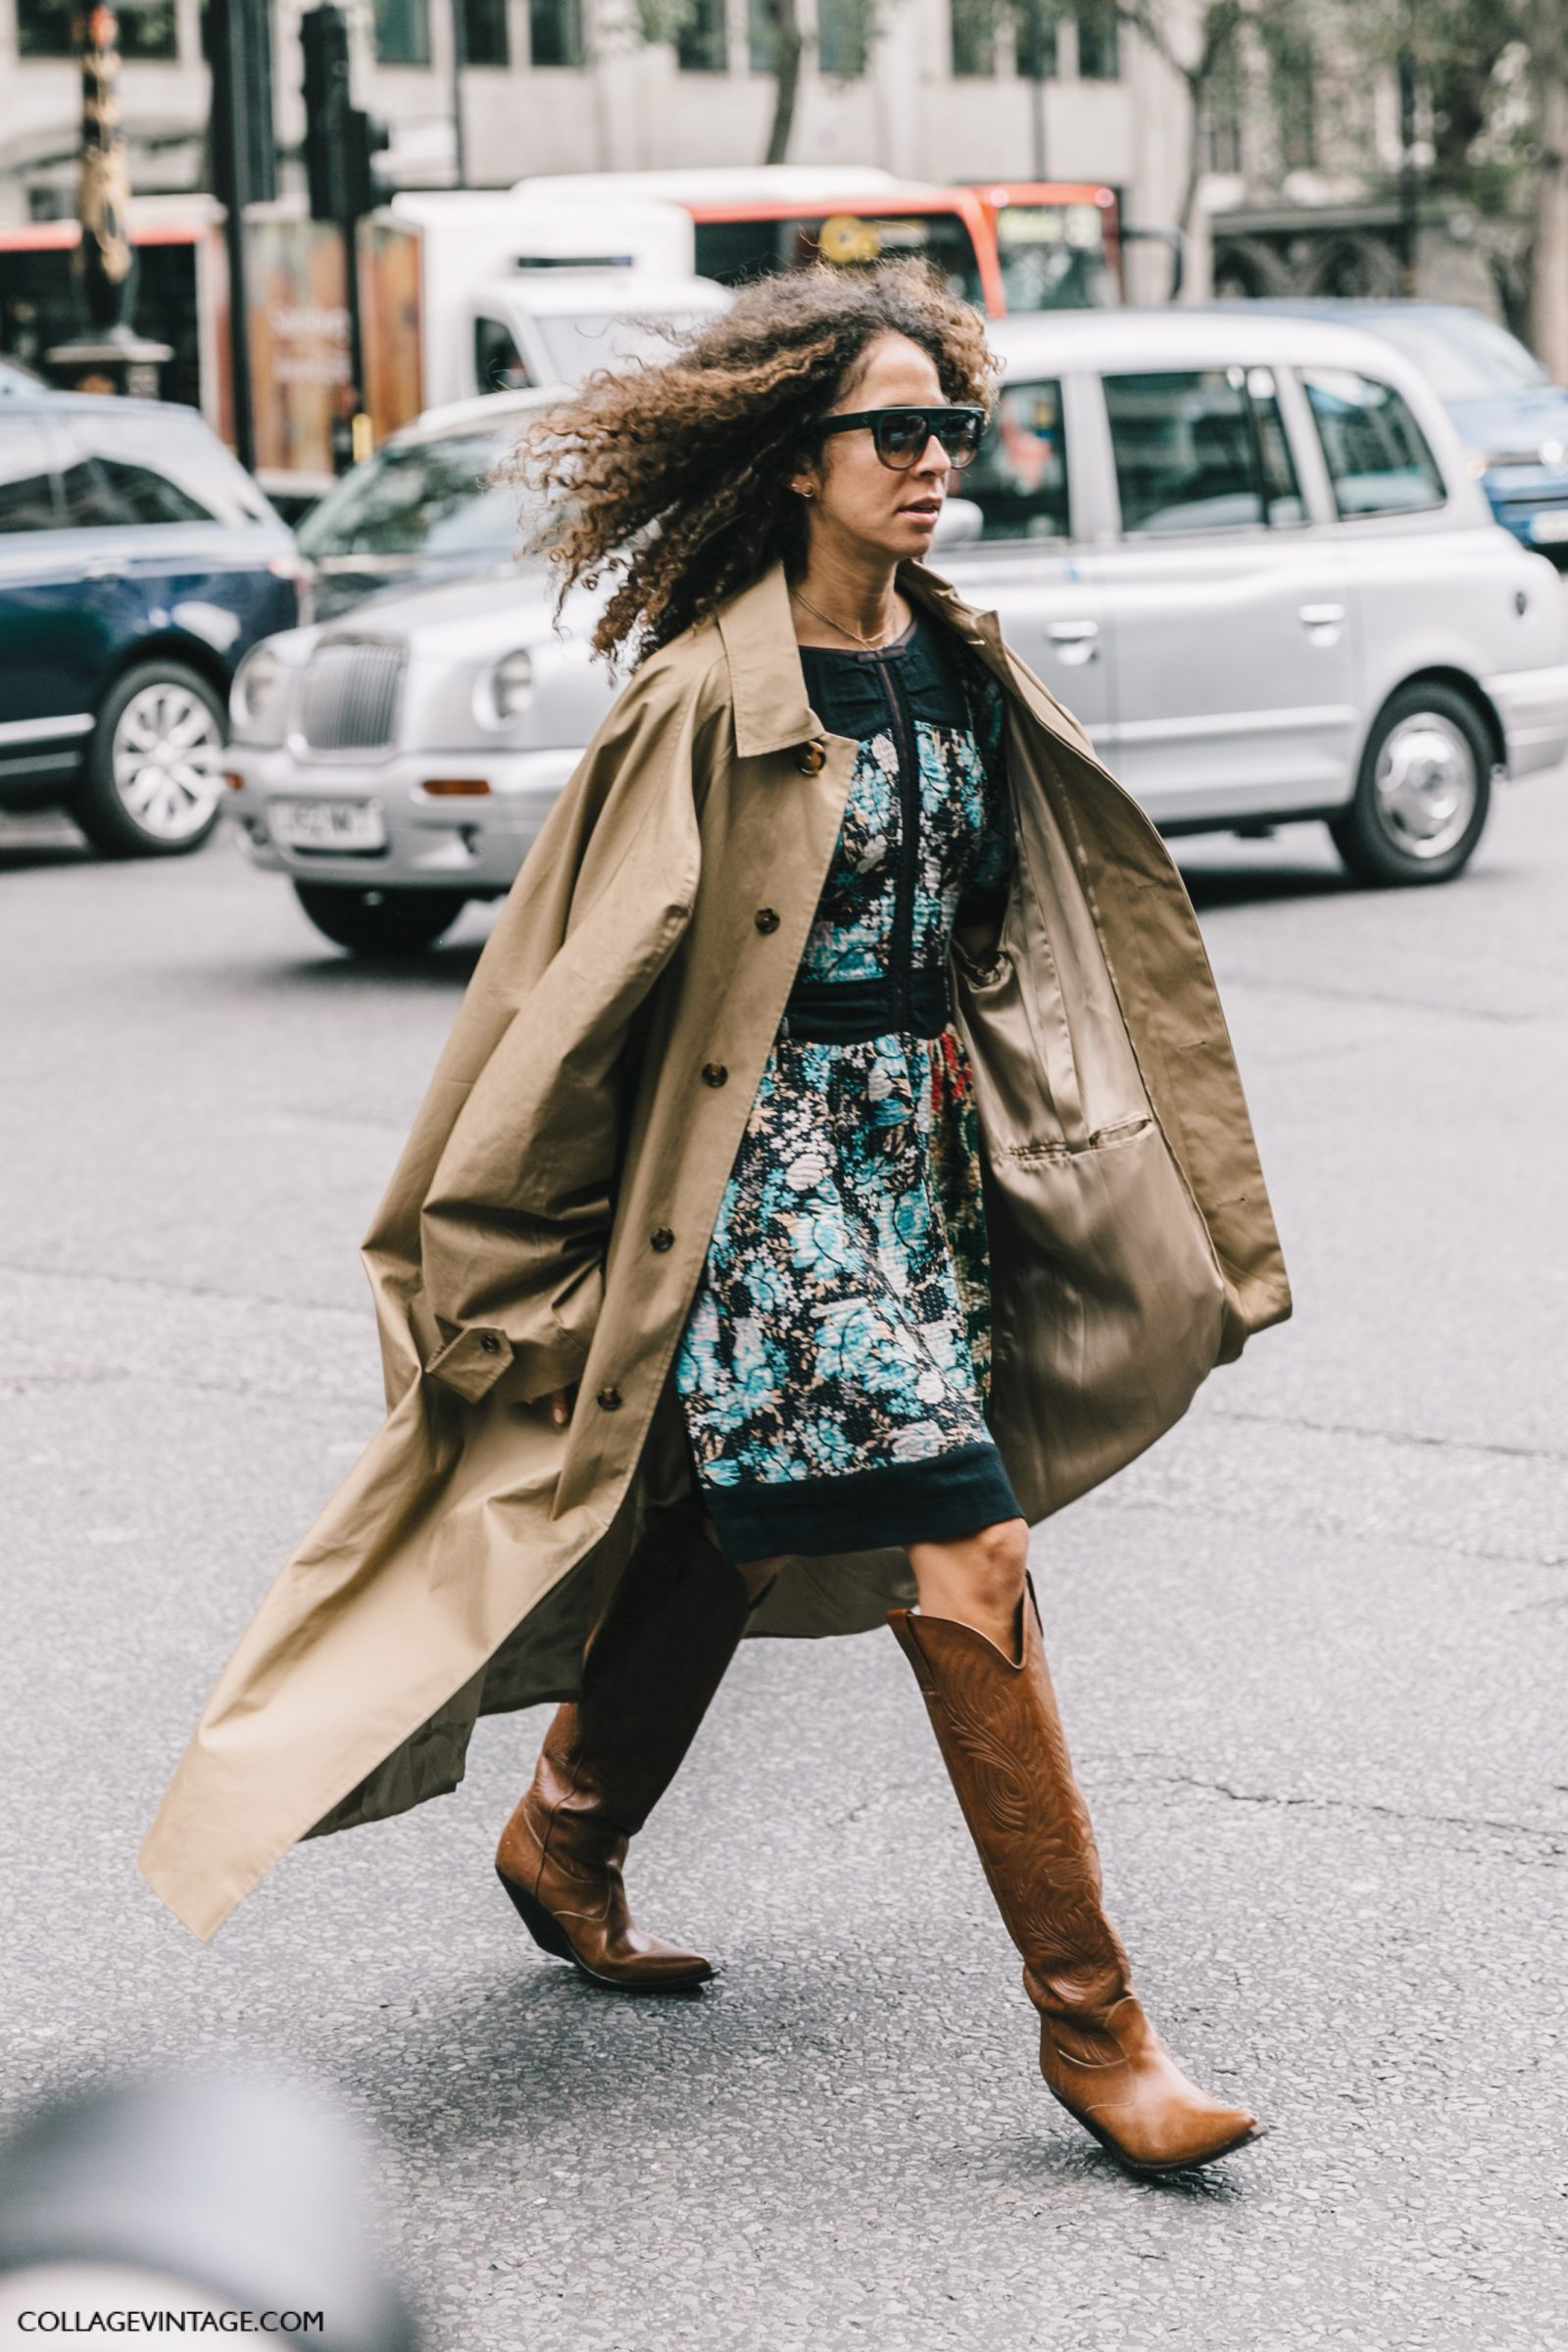 lfw-london_fashion_week_ss17-street_style-outfits-collage_vintage-vintage-roksanda-christopher_kane-joseph-216